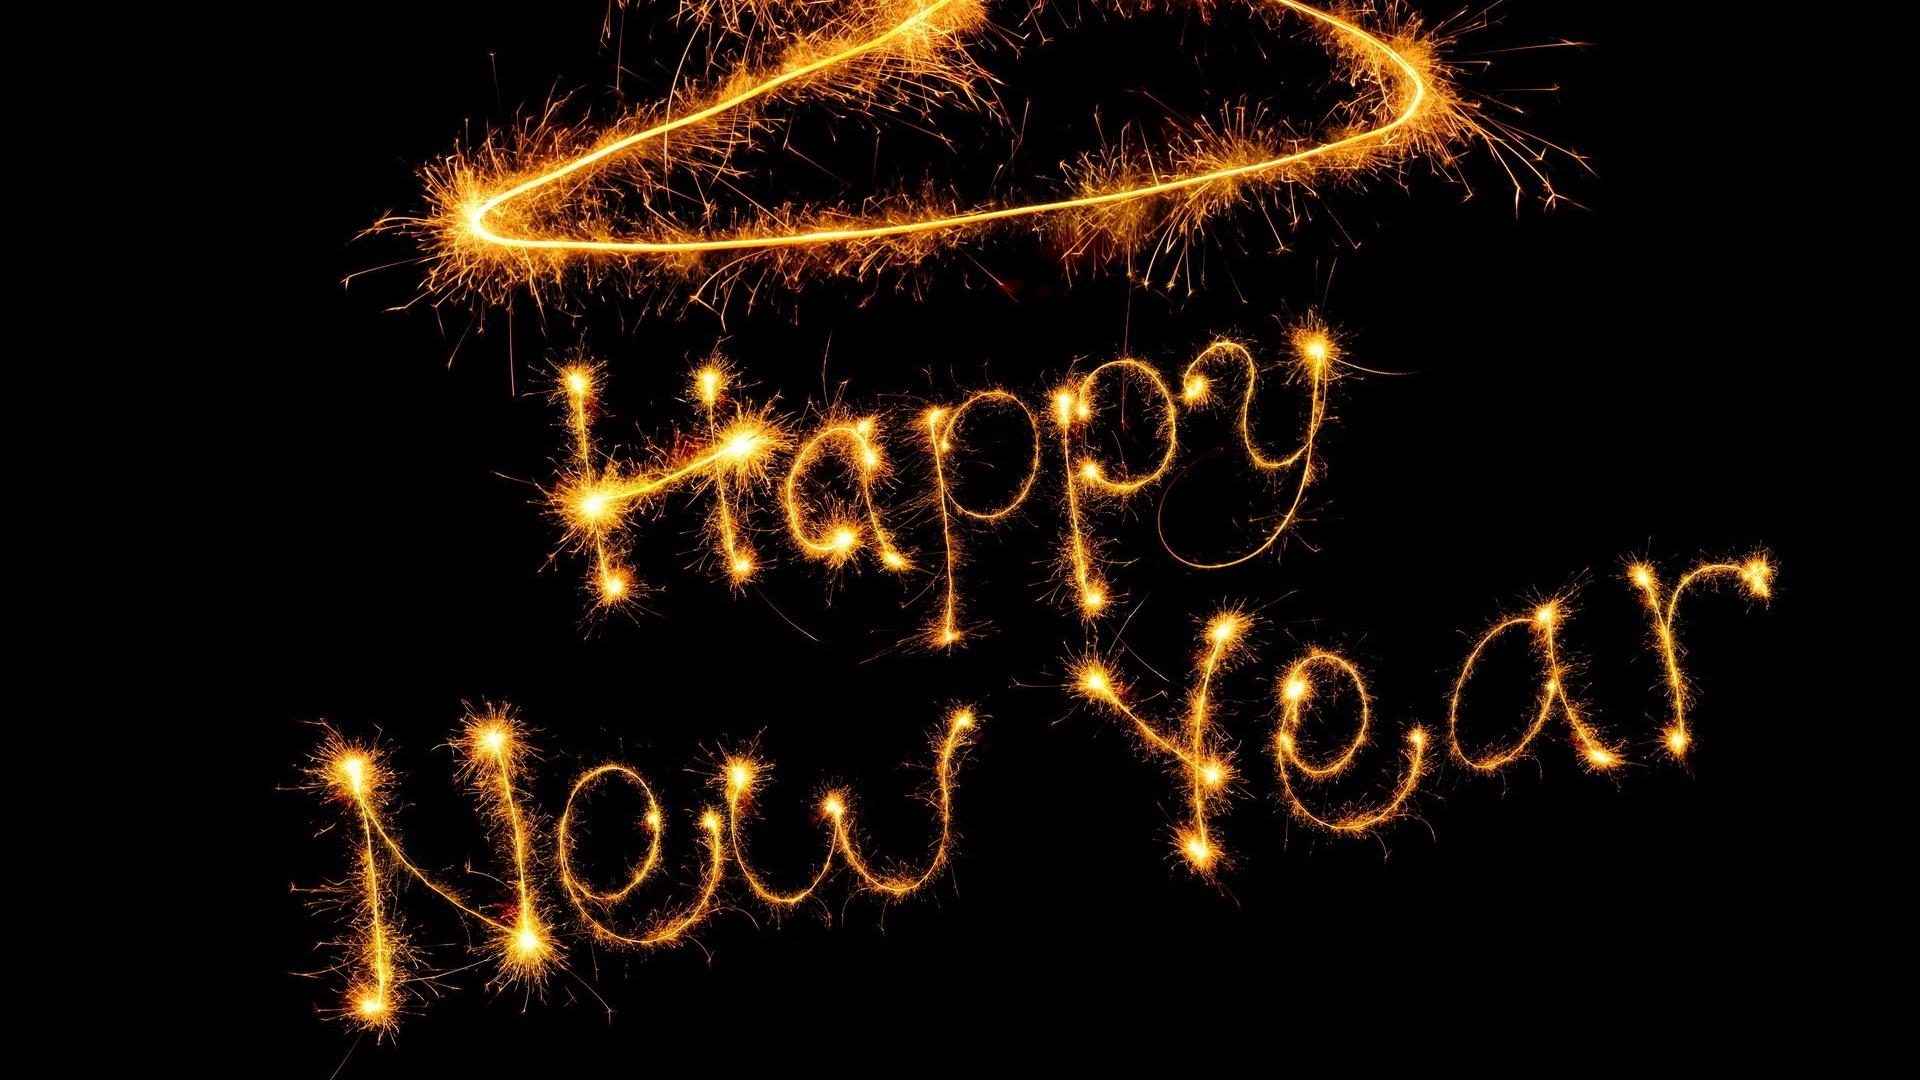 happy_new_year_2013-1920x1080